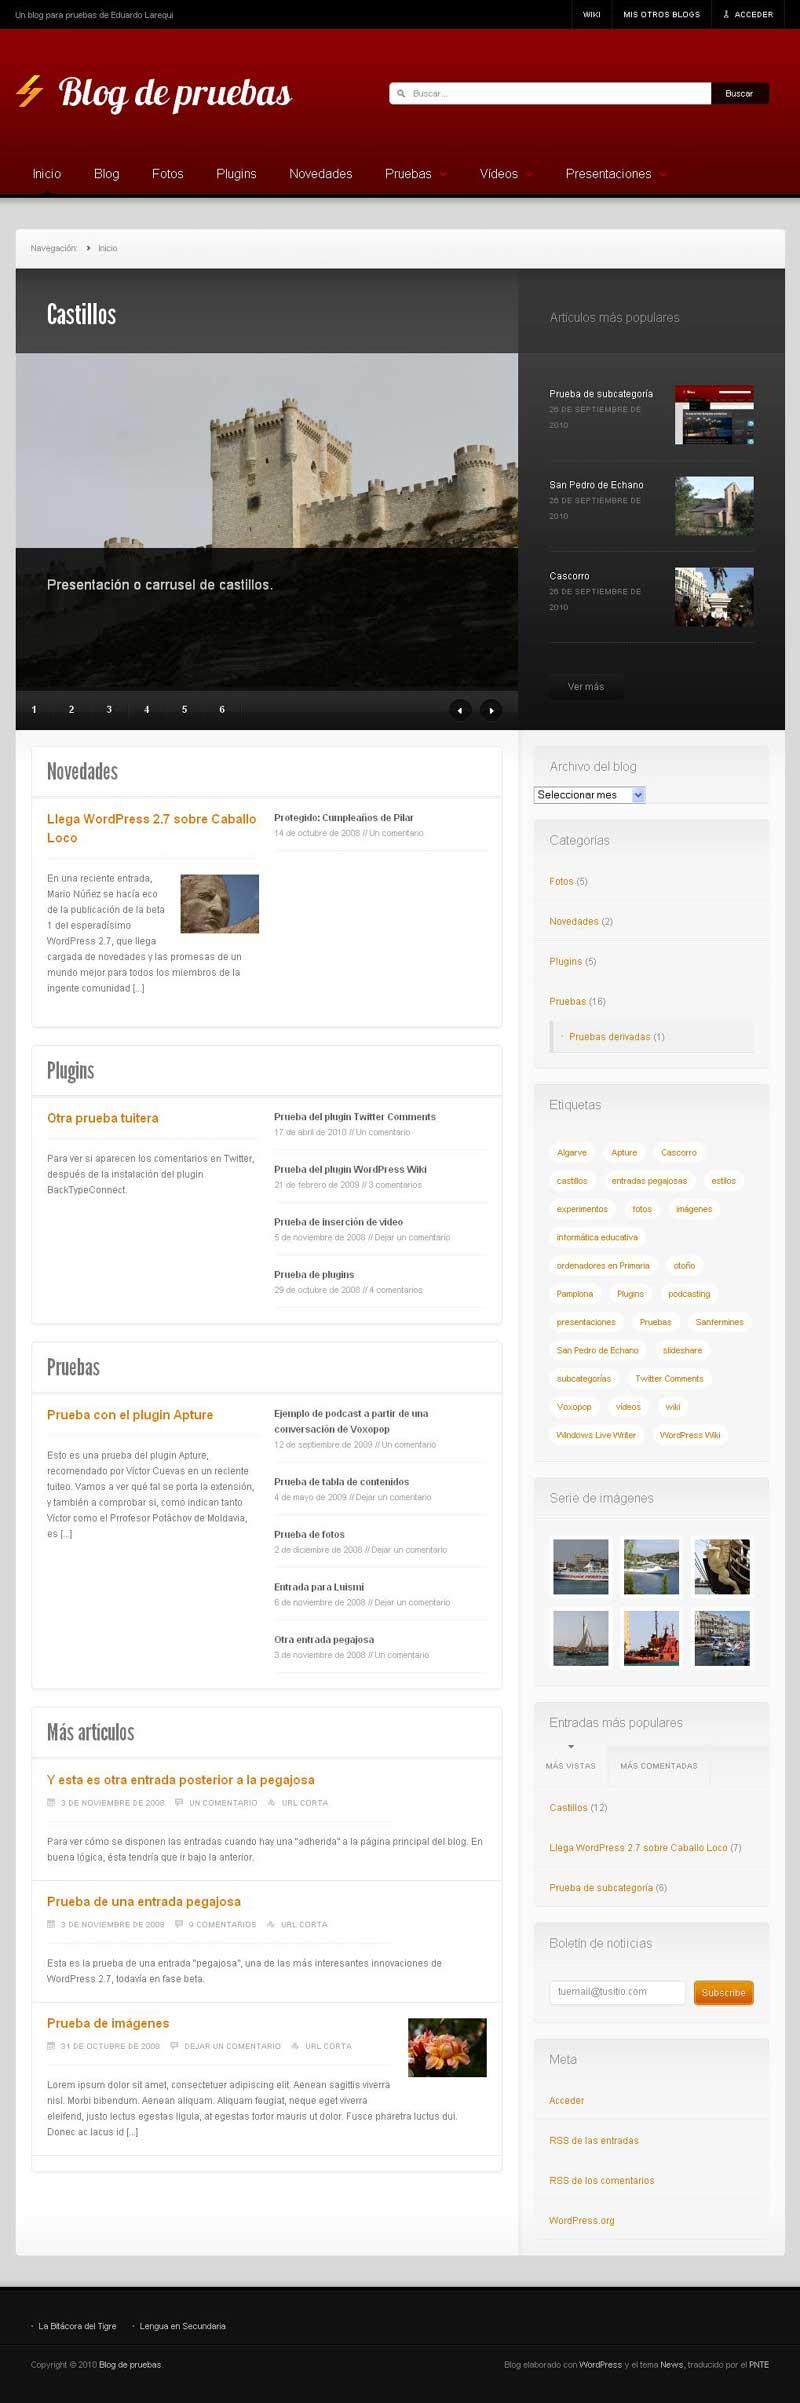 Figura 1 - Tema News, página principal